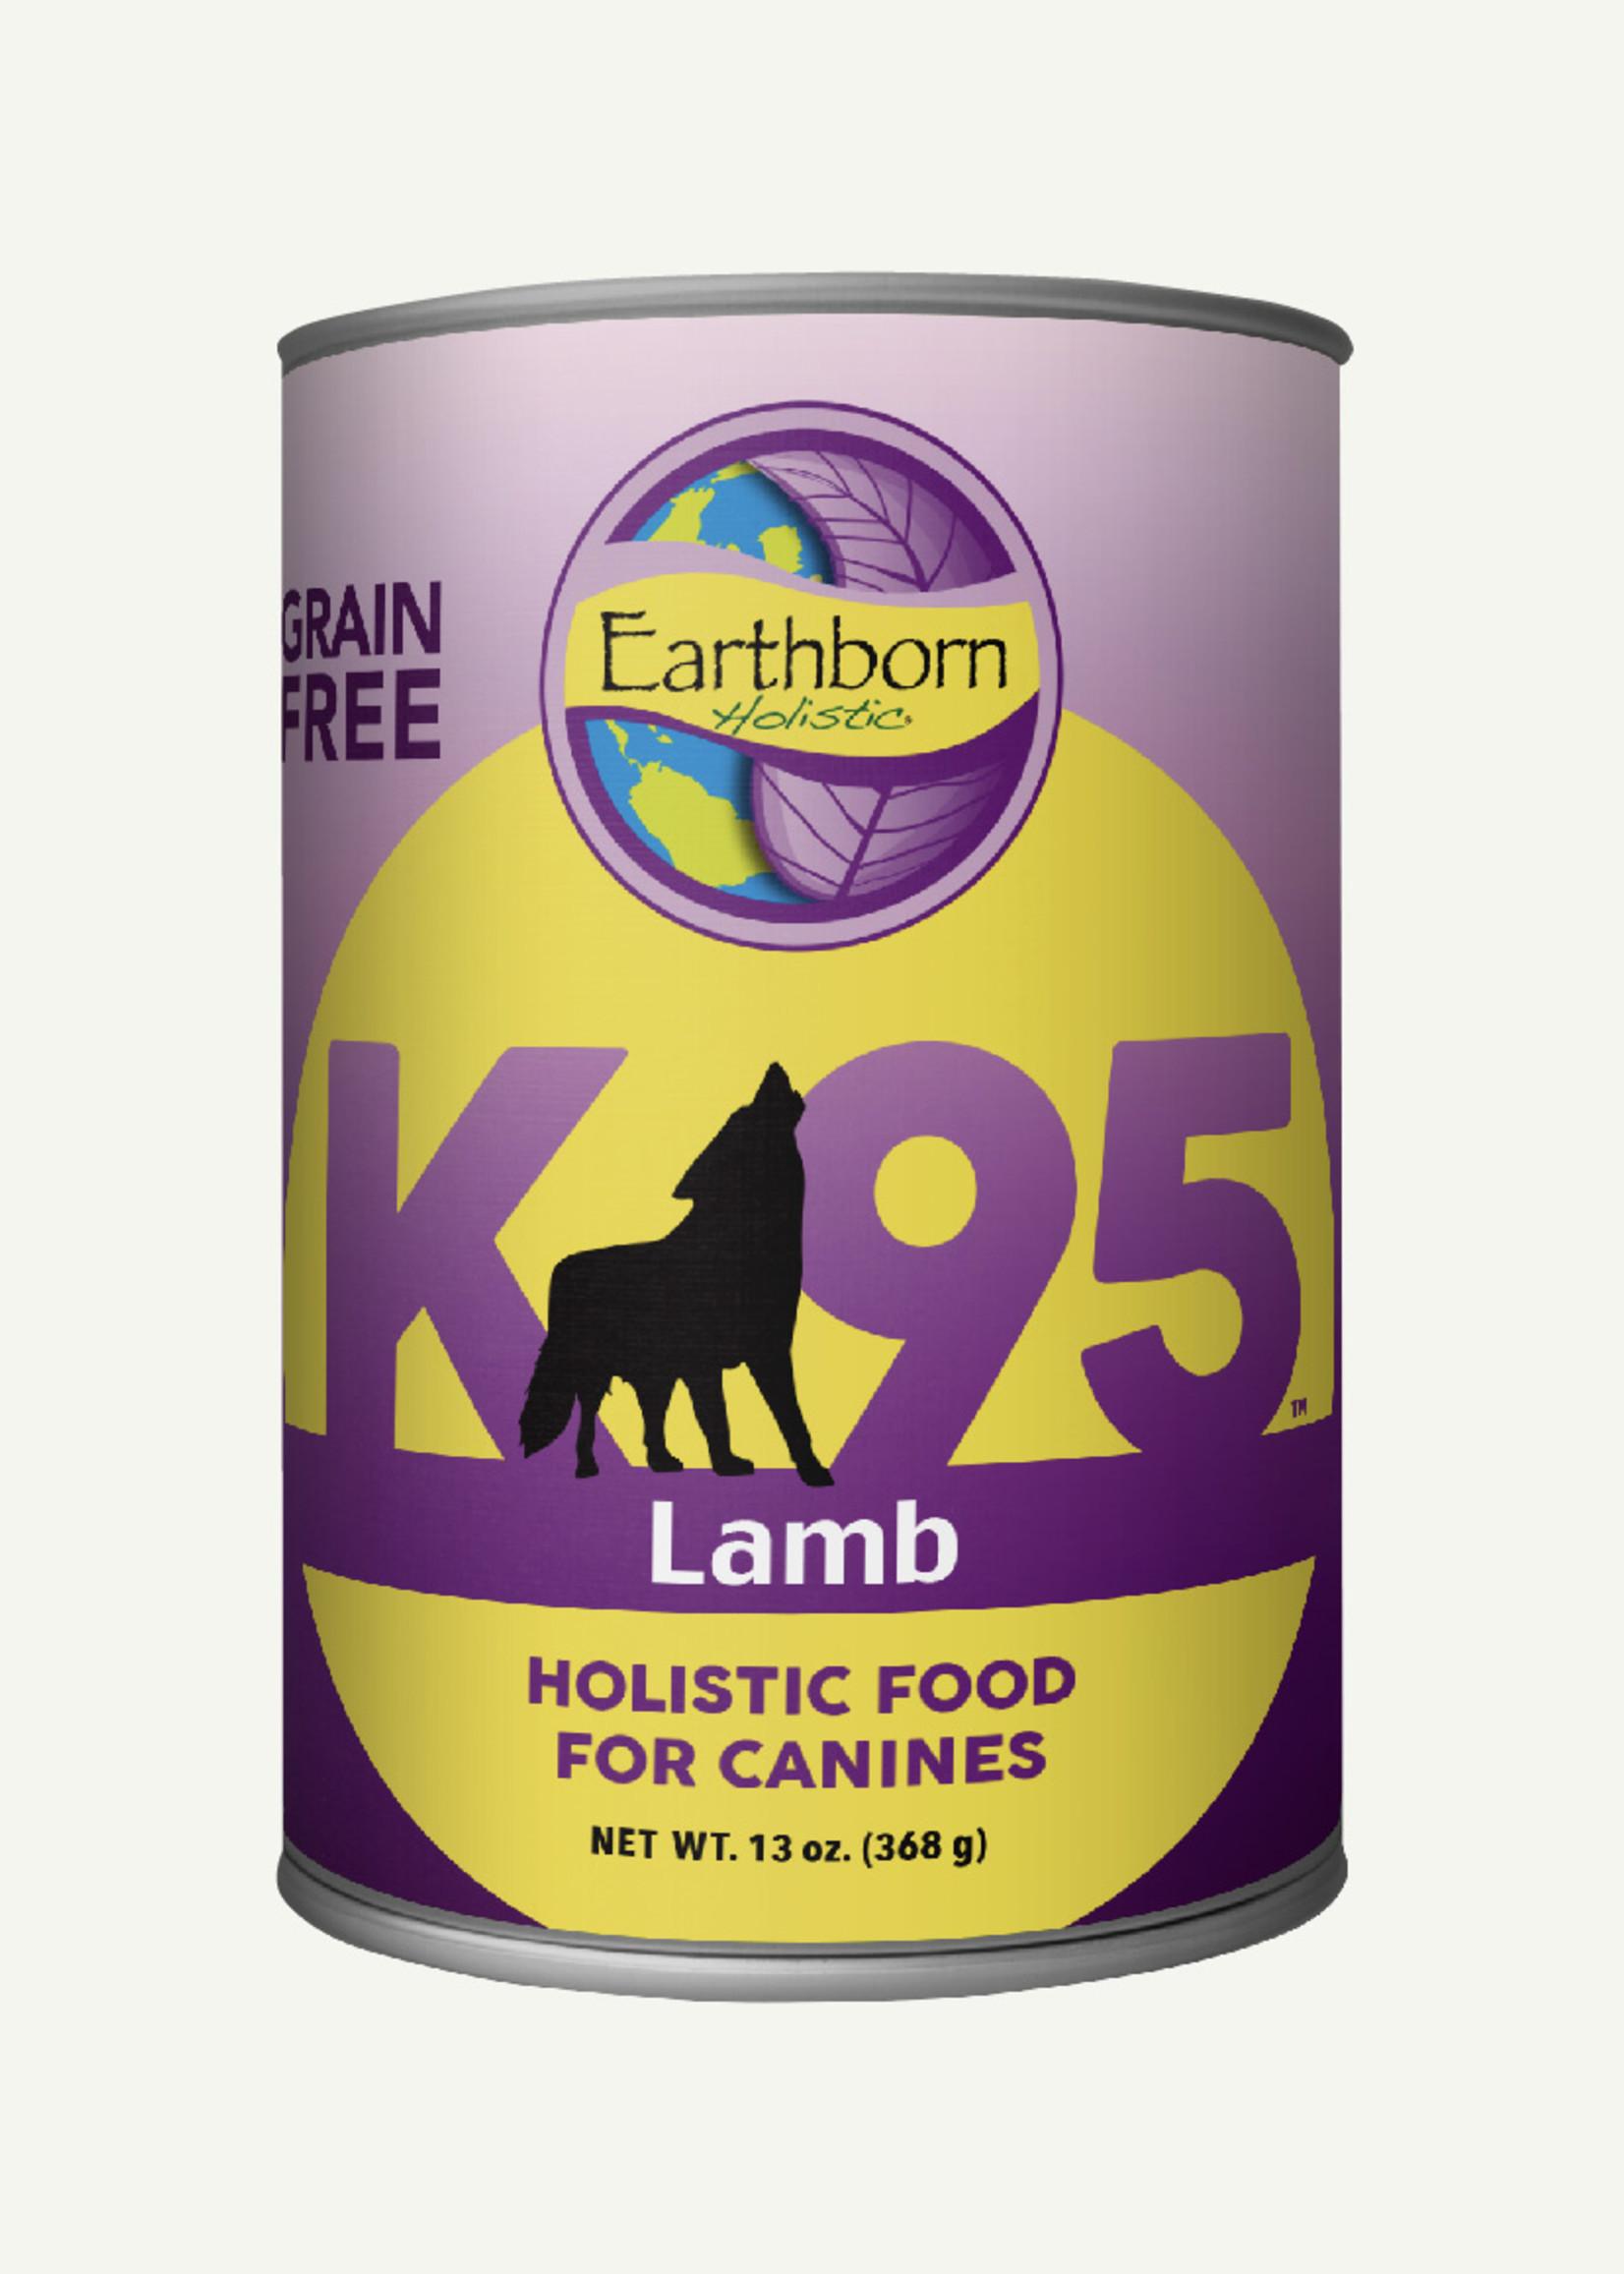 Earthborn Earthborn K95 Lamb Grain Free 13 oz Case